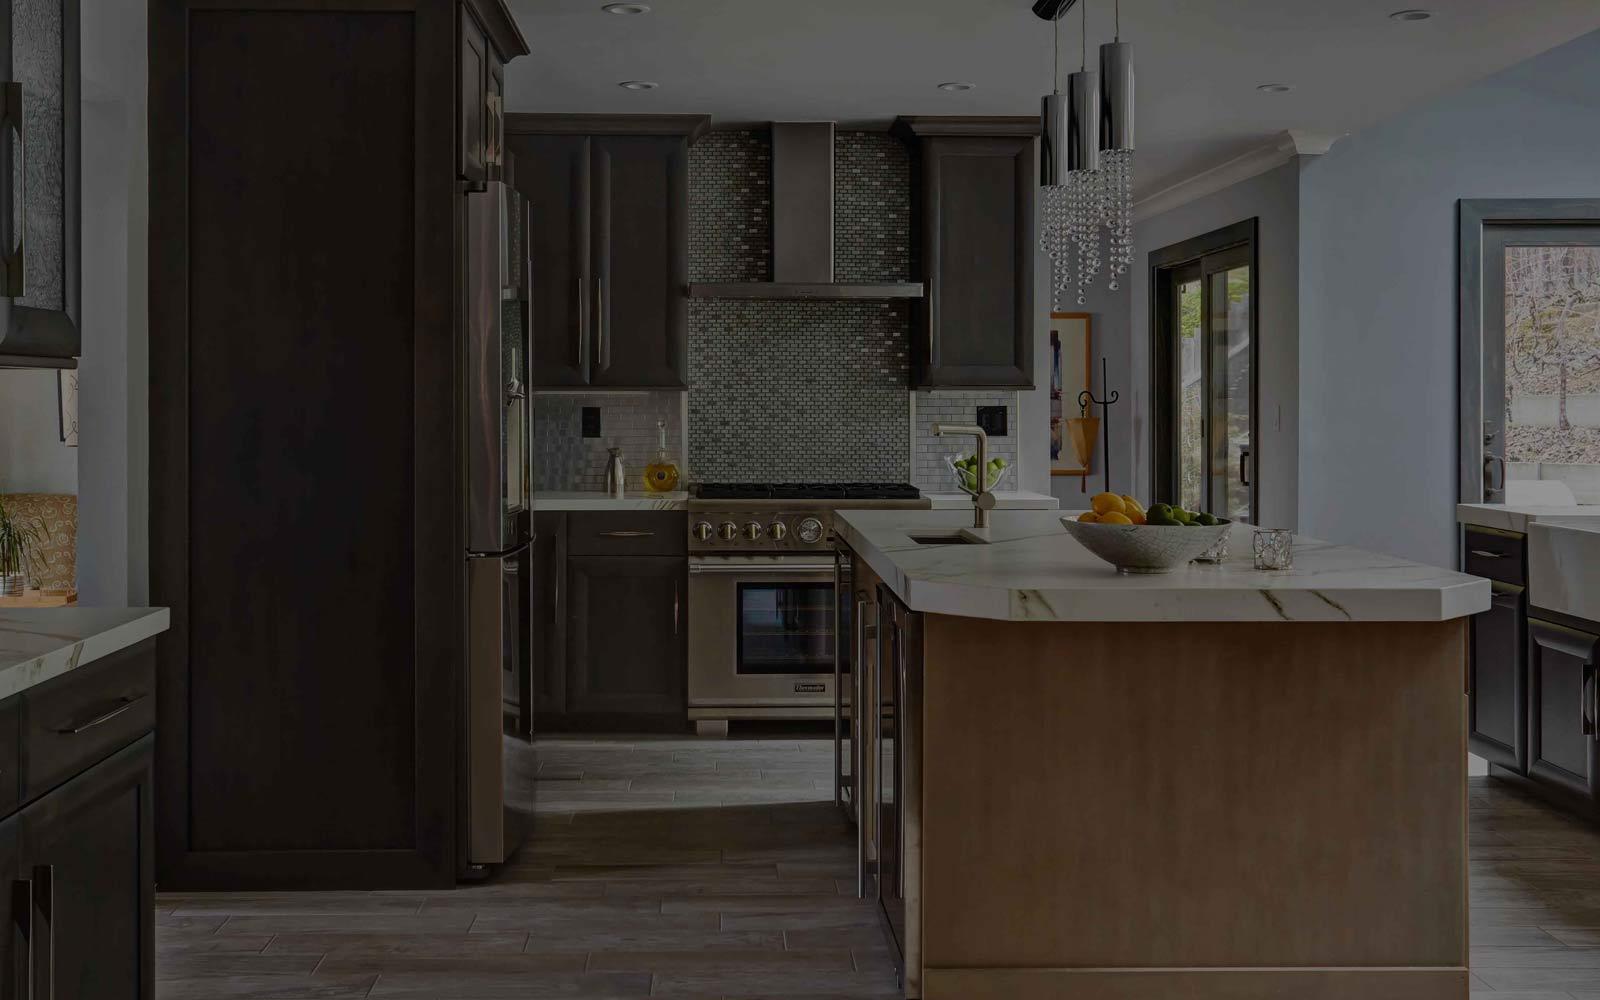 sigkb kitchen and bath design COPYRIGHT SIGNATURE KITCHEN BATH DESIGN INC